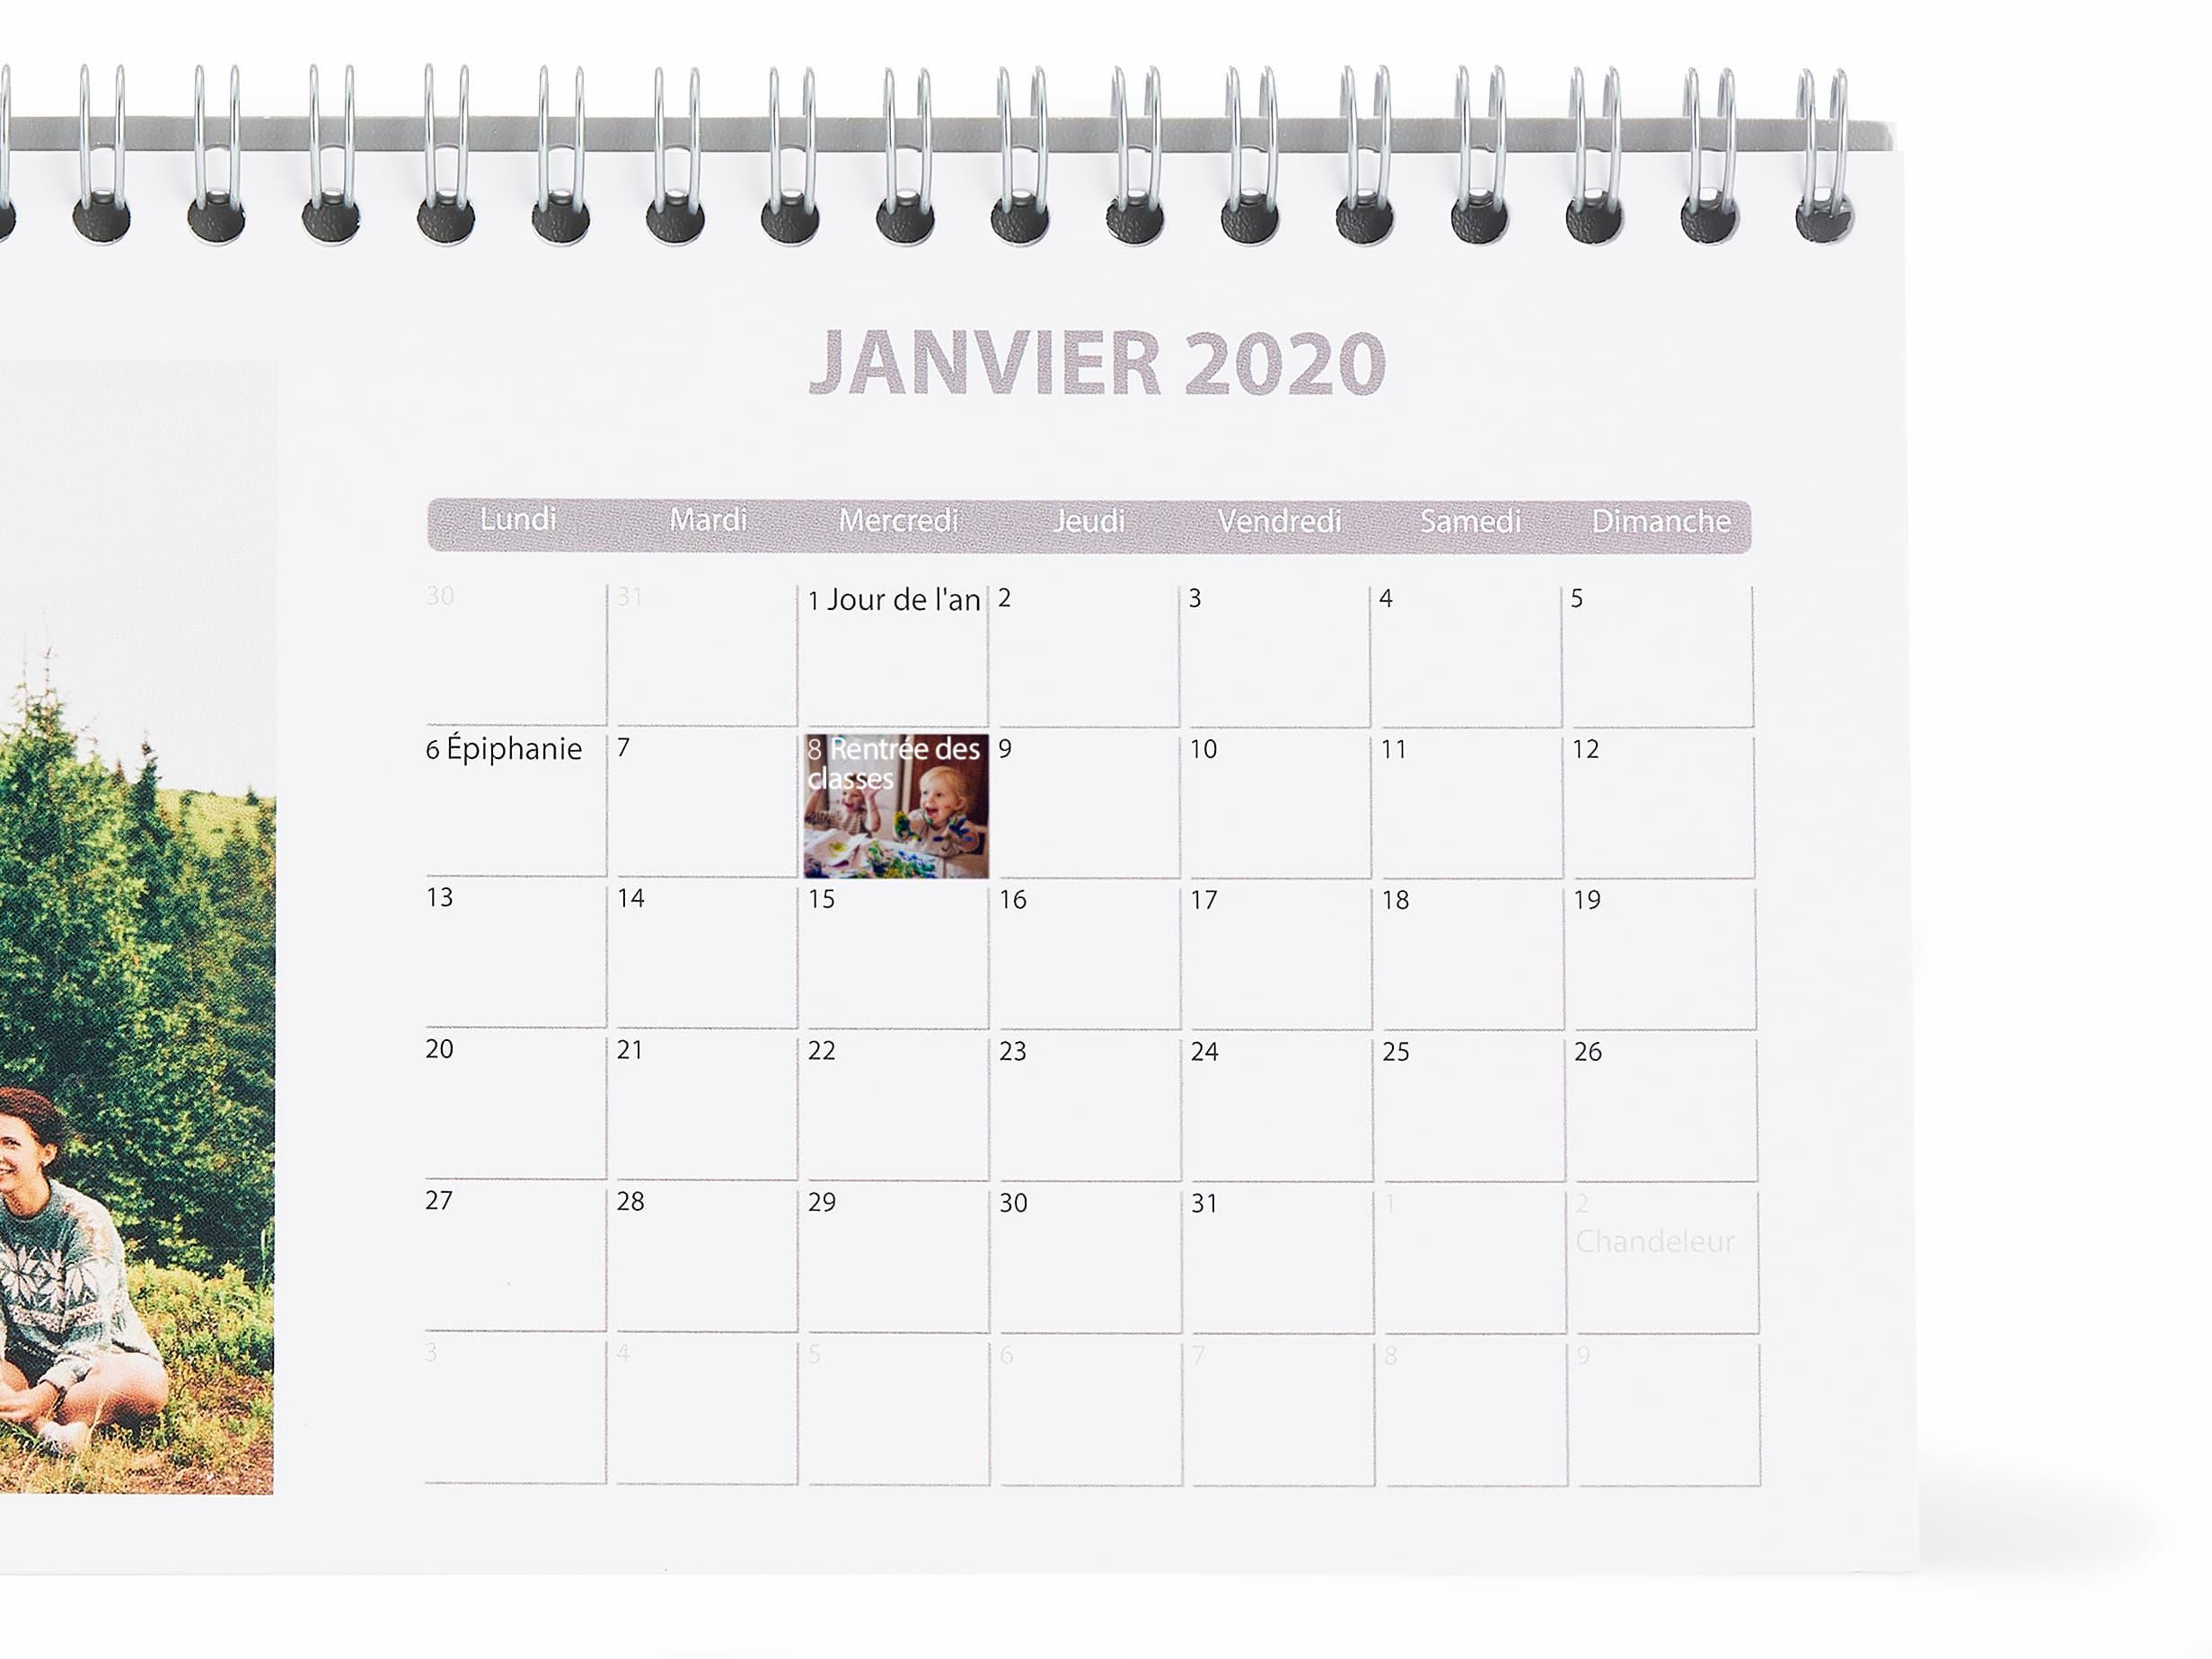 Calendrier Perpetuel Personnalise 365 Jours.Calendrier Photo A Imprimer Agenda Personnalise Photobox